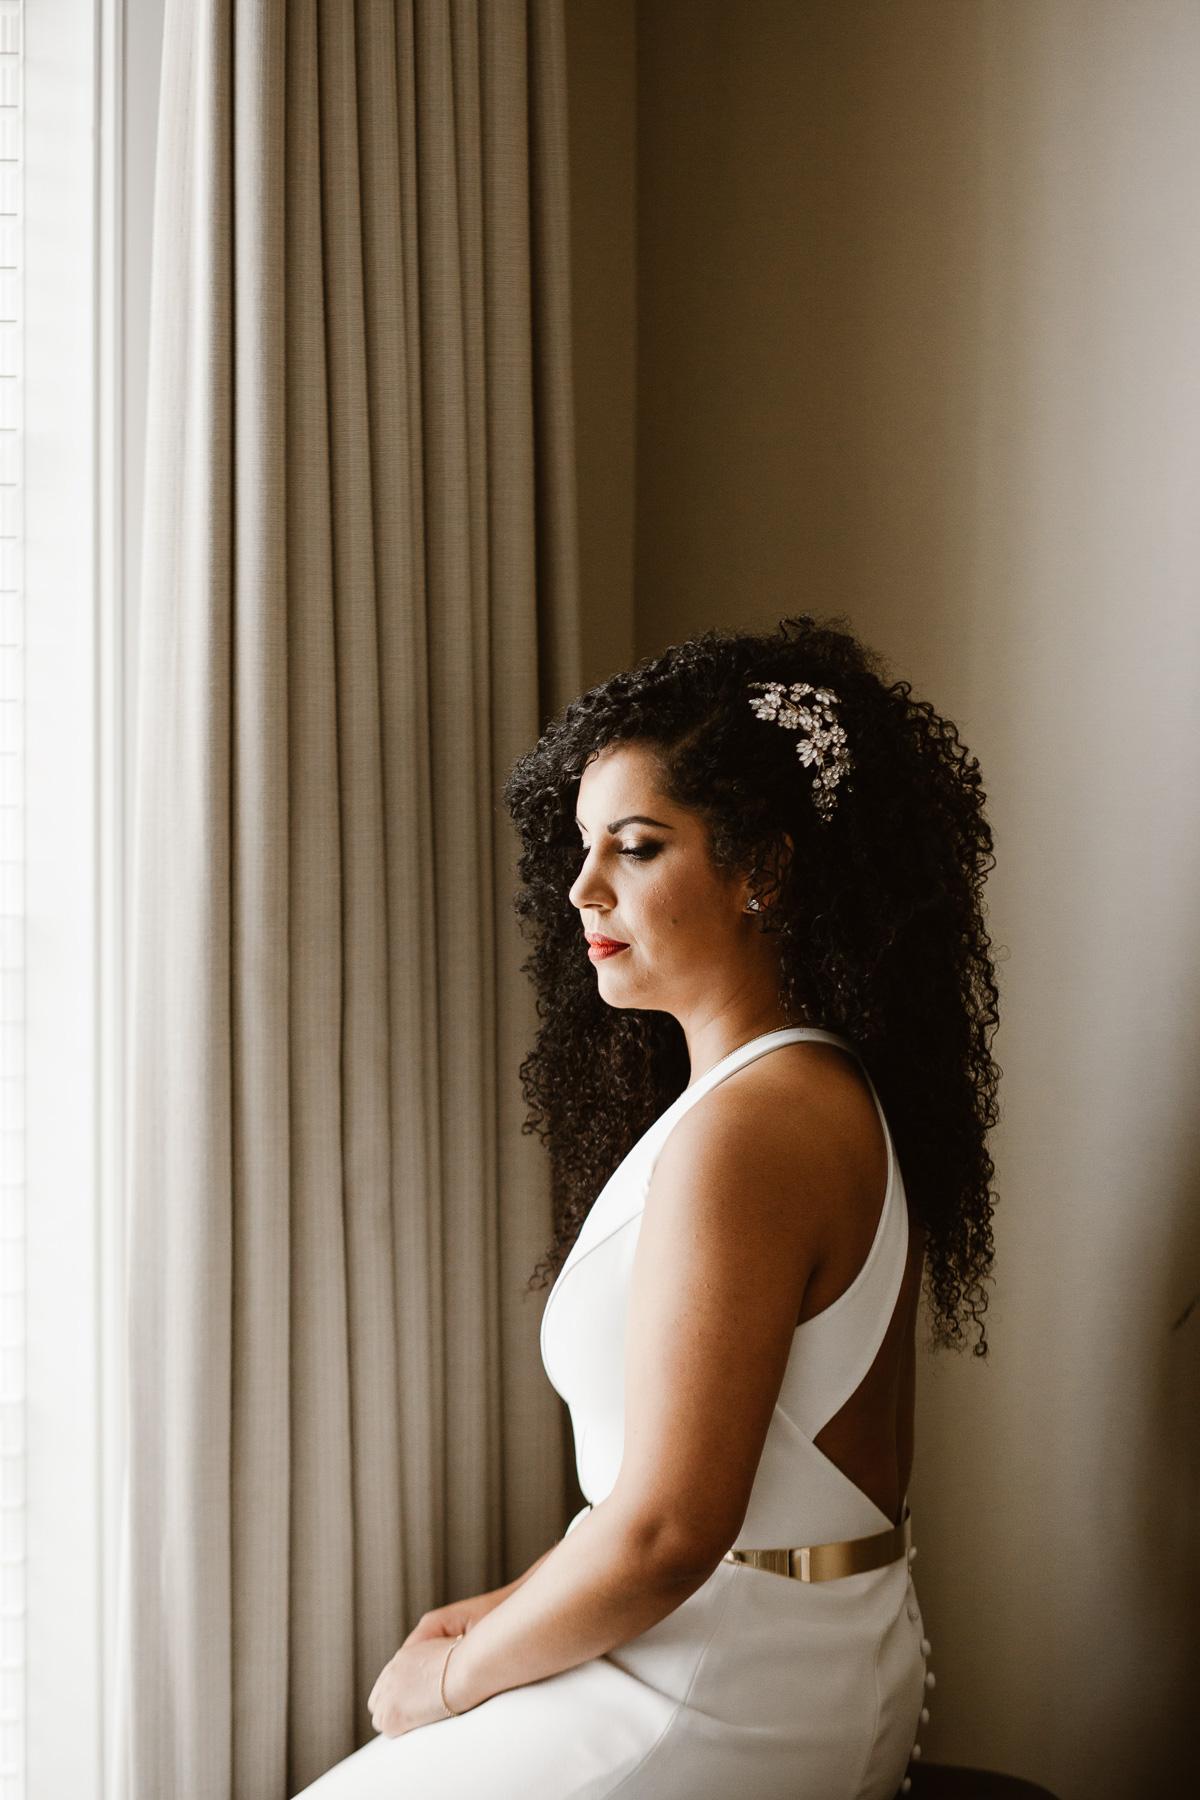 reed-photography-vineyard-bride-swish-list-stratus-winery-niagara-on-the-lake-wedding-15.jpg